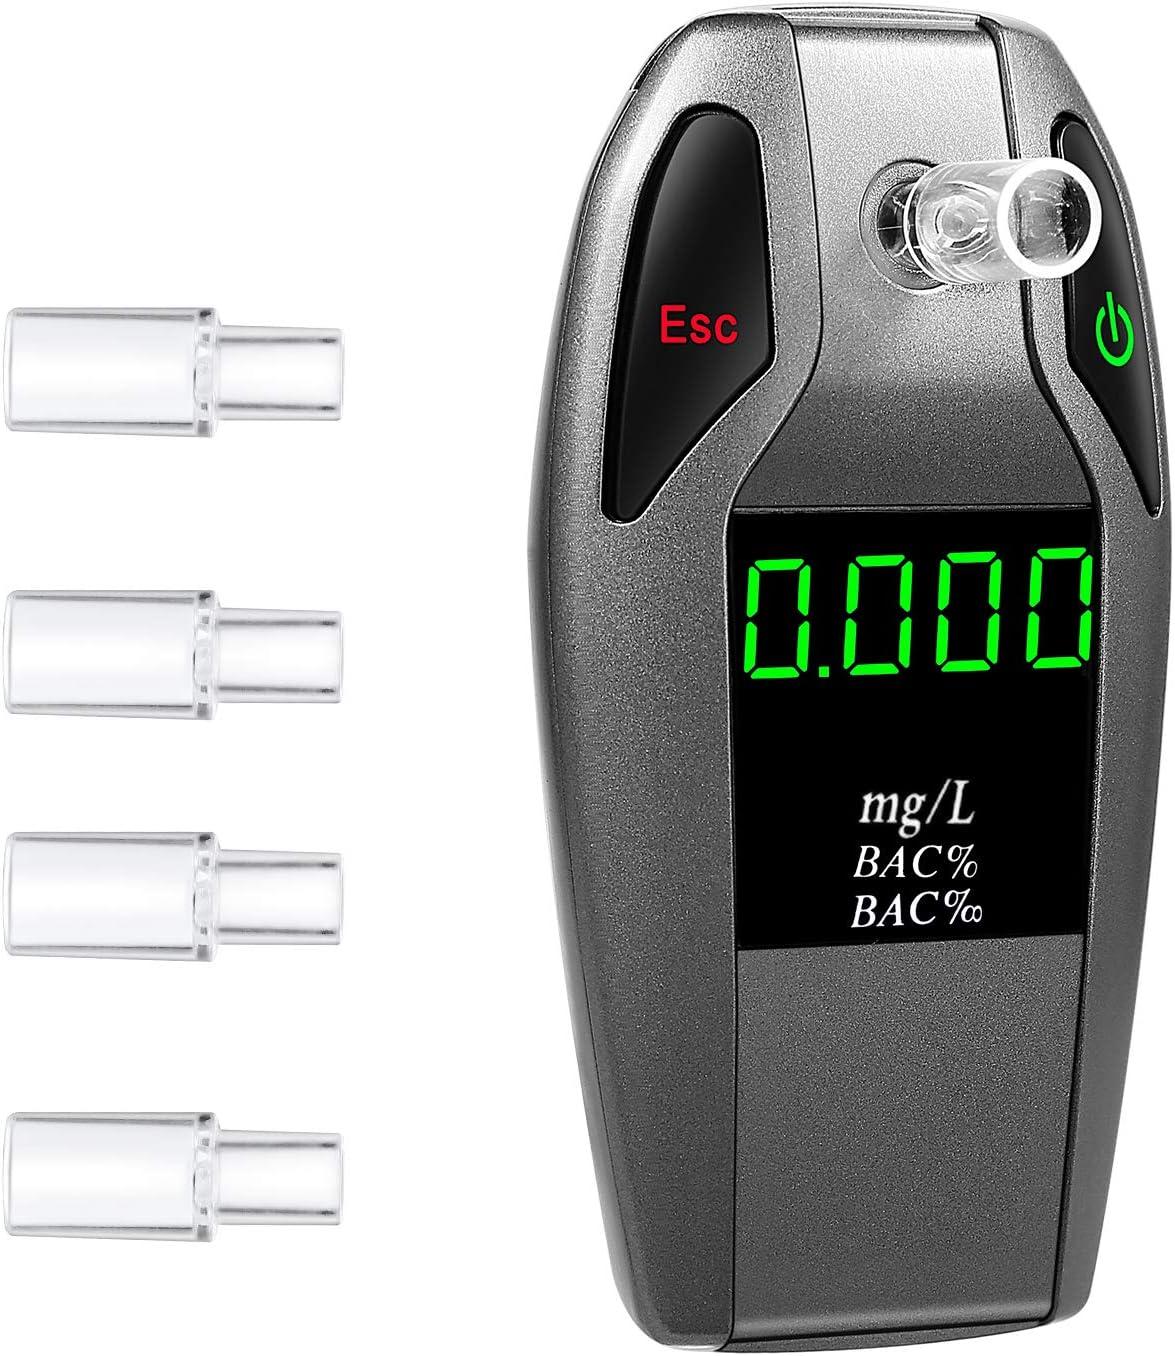 JASTEK Breathalyzer Professional-Grade Accuracy Sen Cell 25% OFF Fuel Boston Mall